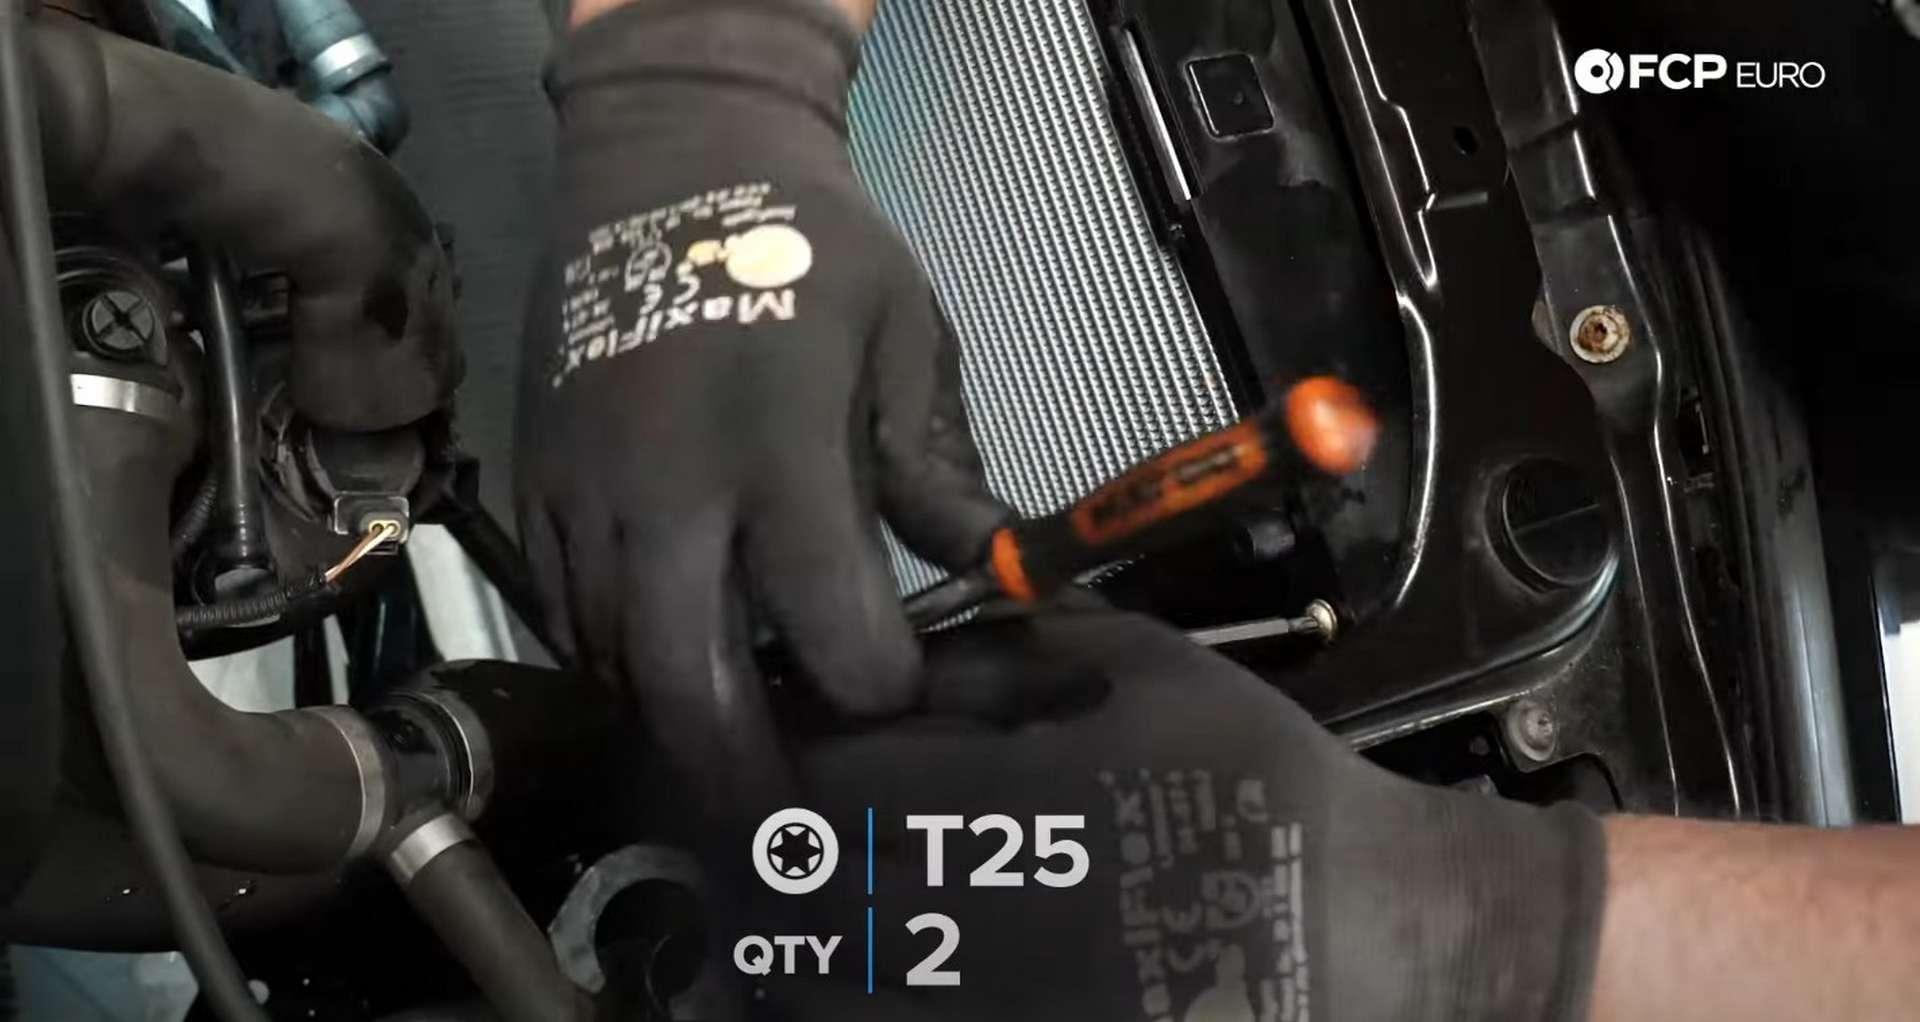 DIY BMW F30 Radiator Replacement installing the radiator mounting plate